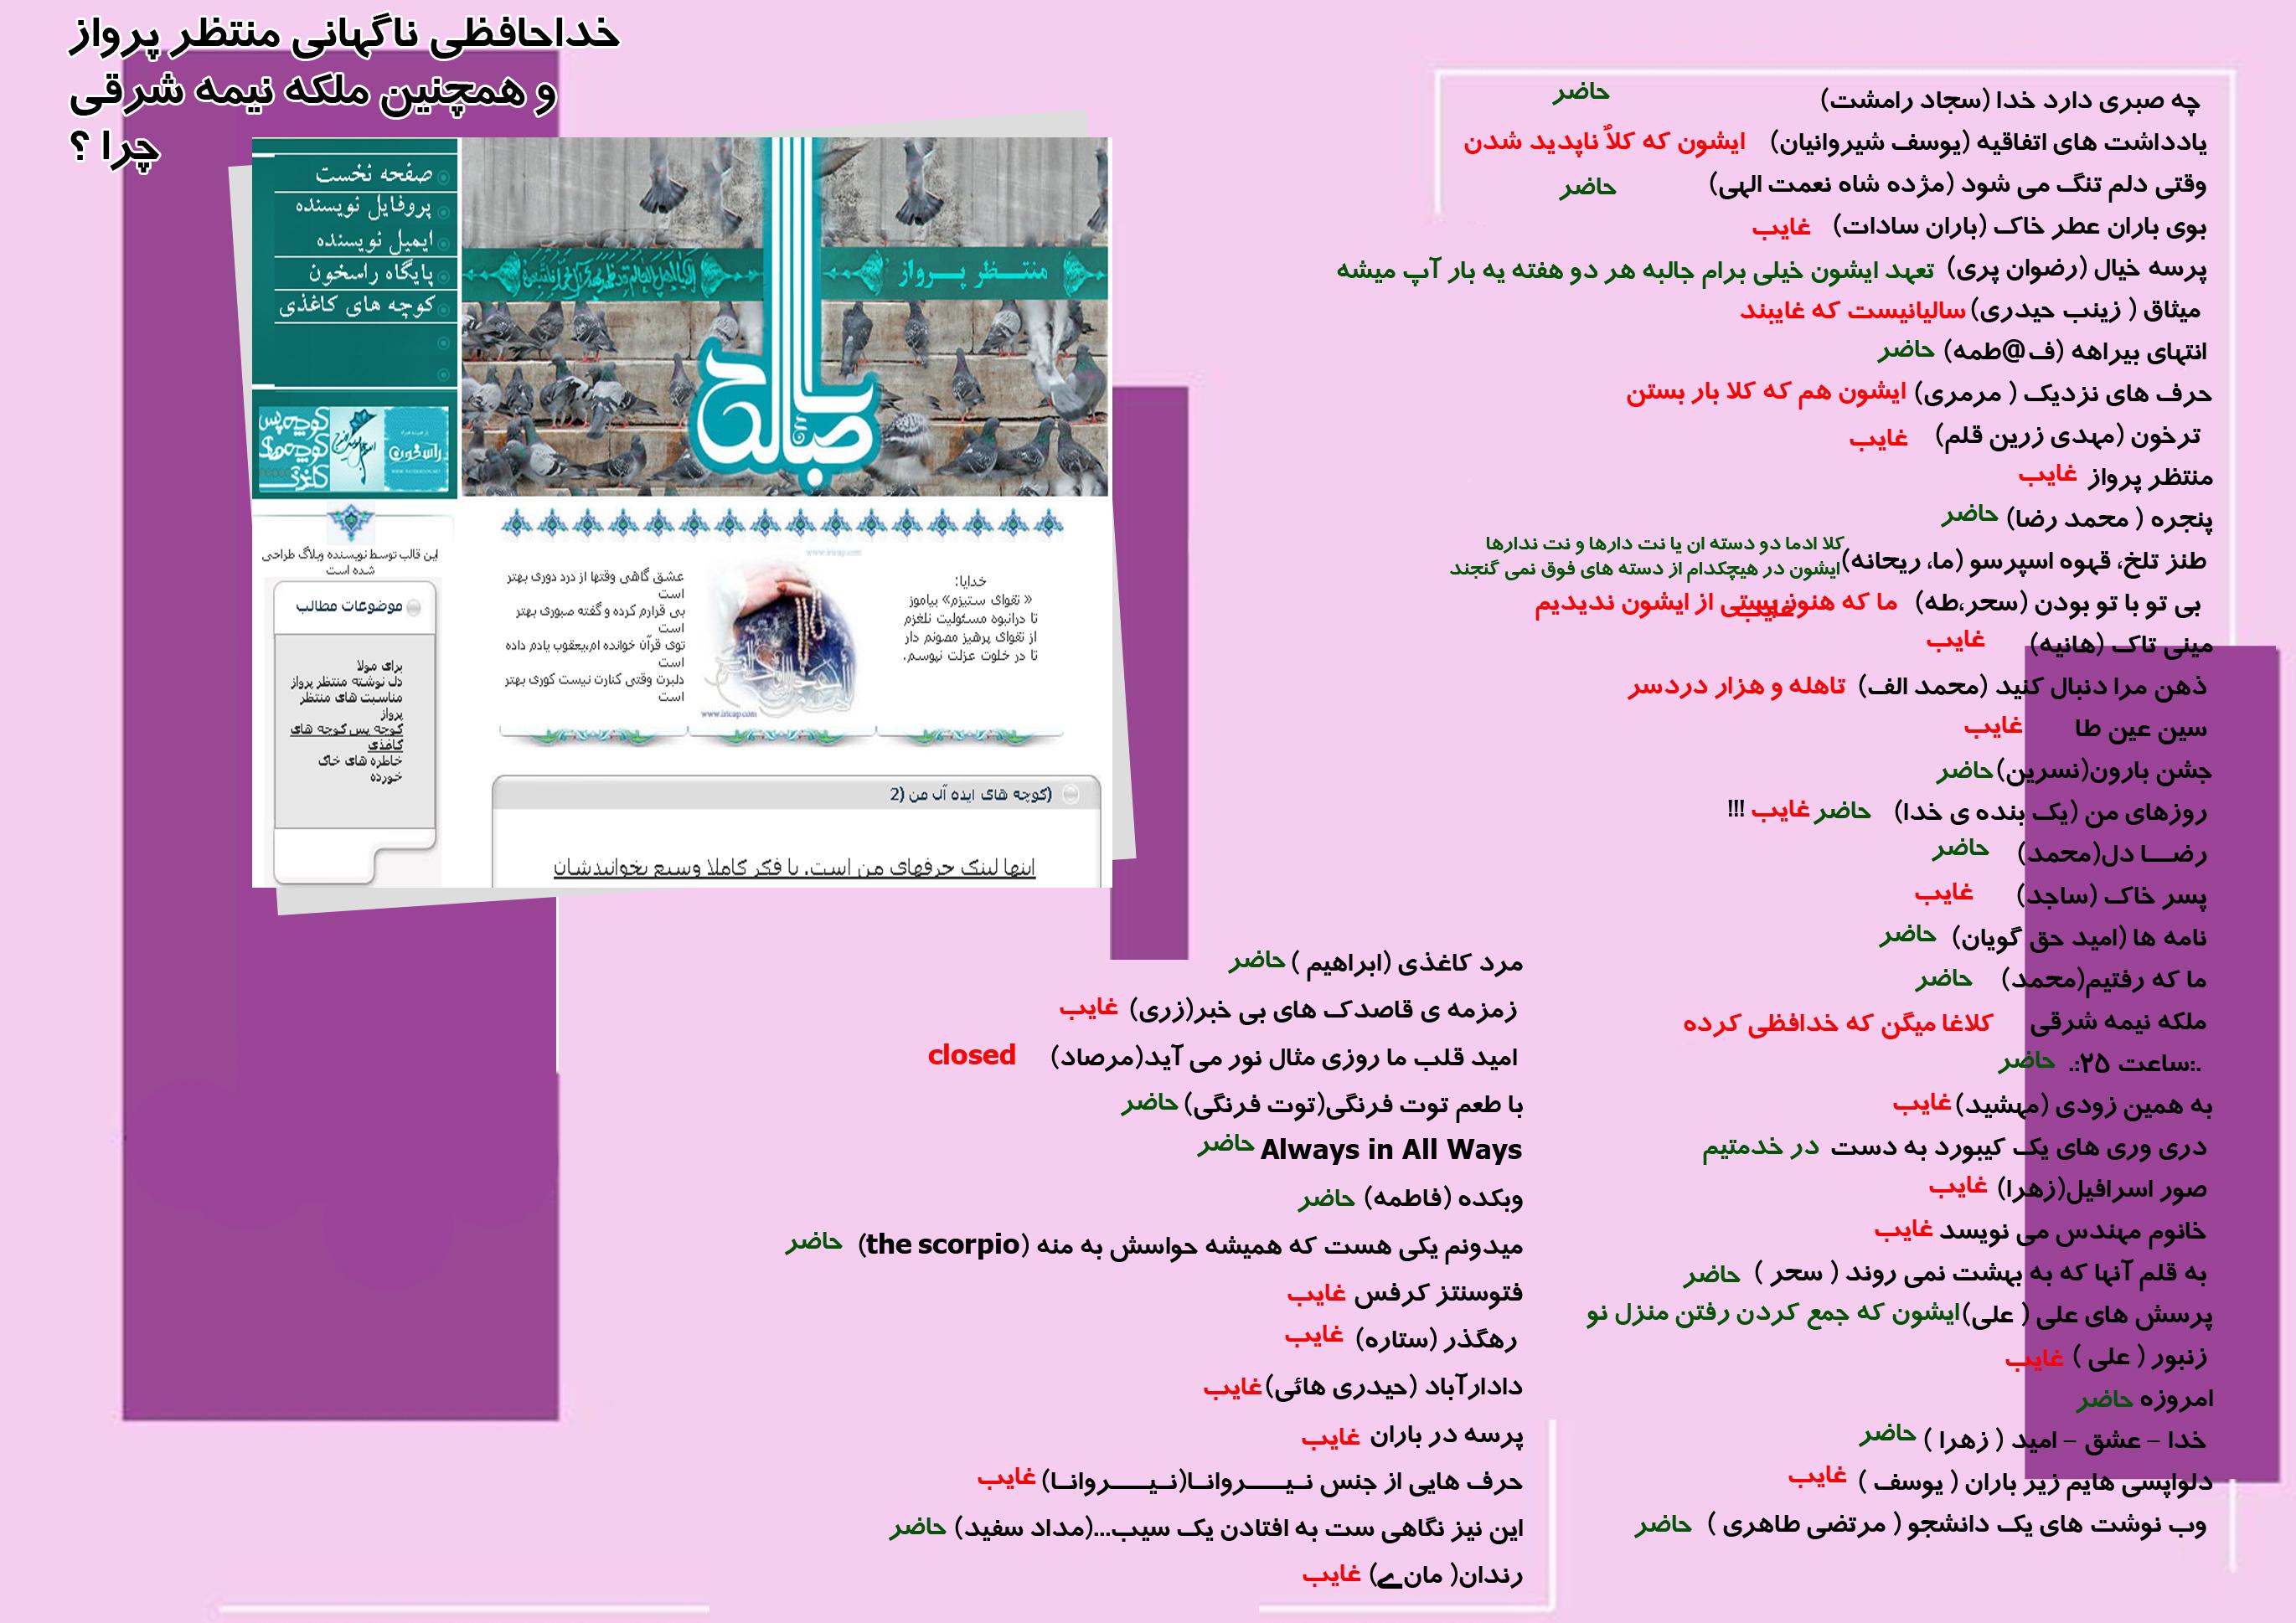 http://s2.picofile.com/file/7229973759/Parazit_0002.jpg